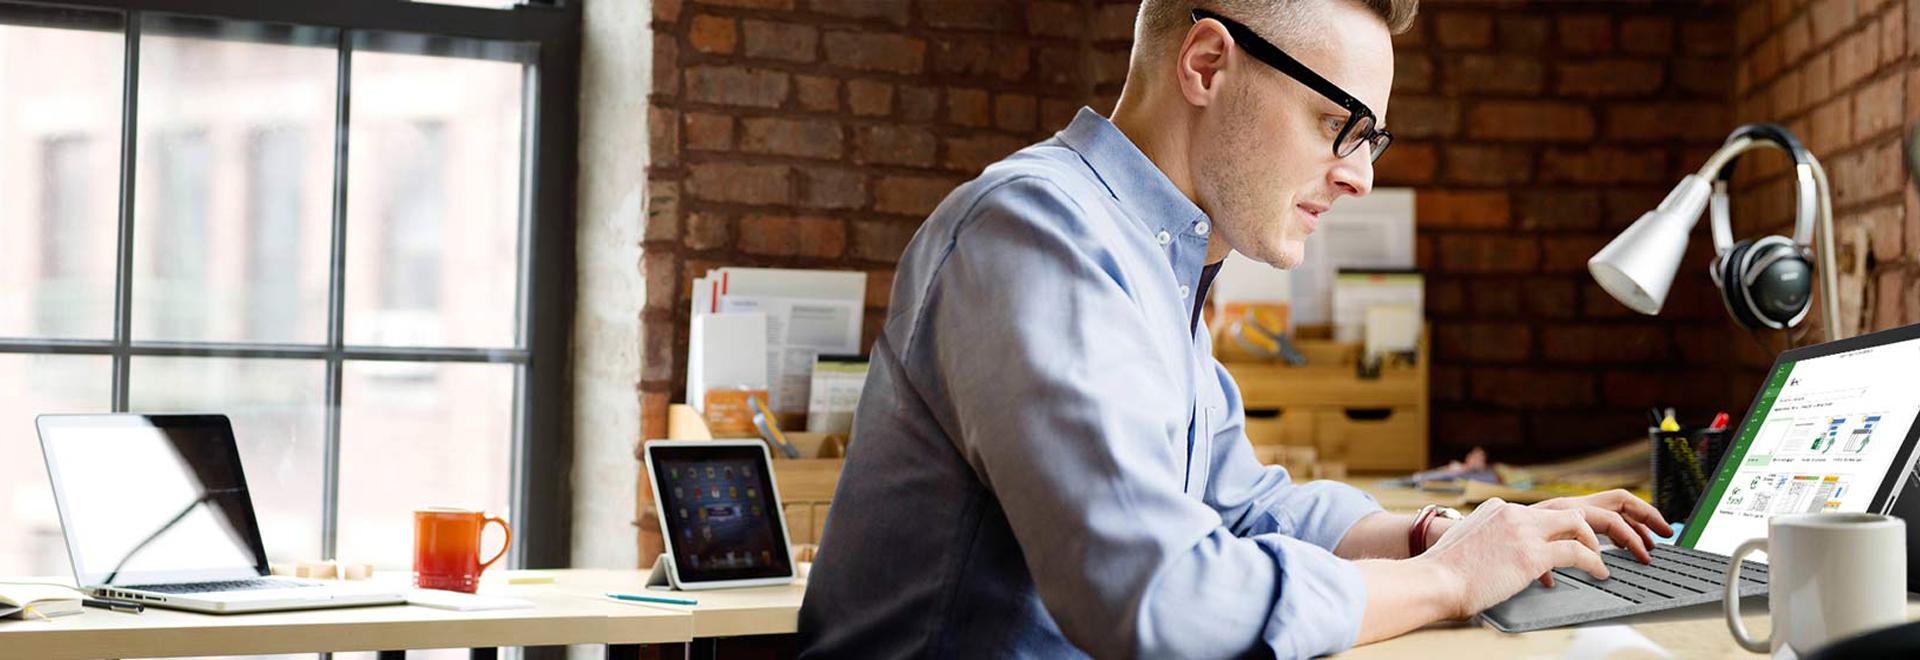 Čovek sedi za radnim stolom i radi na Surface tablet računaru pomoću programa Microsoft Project.